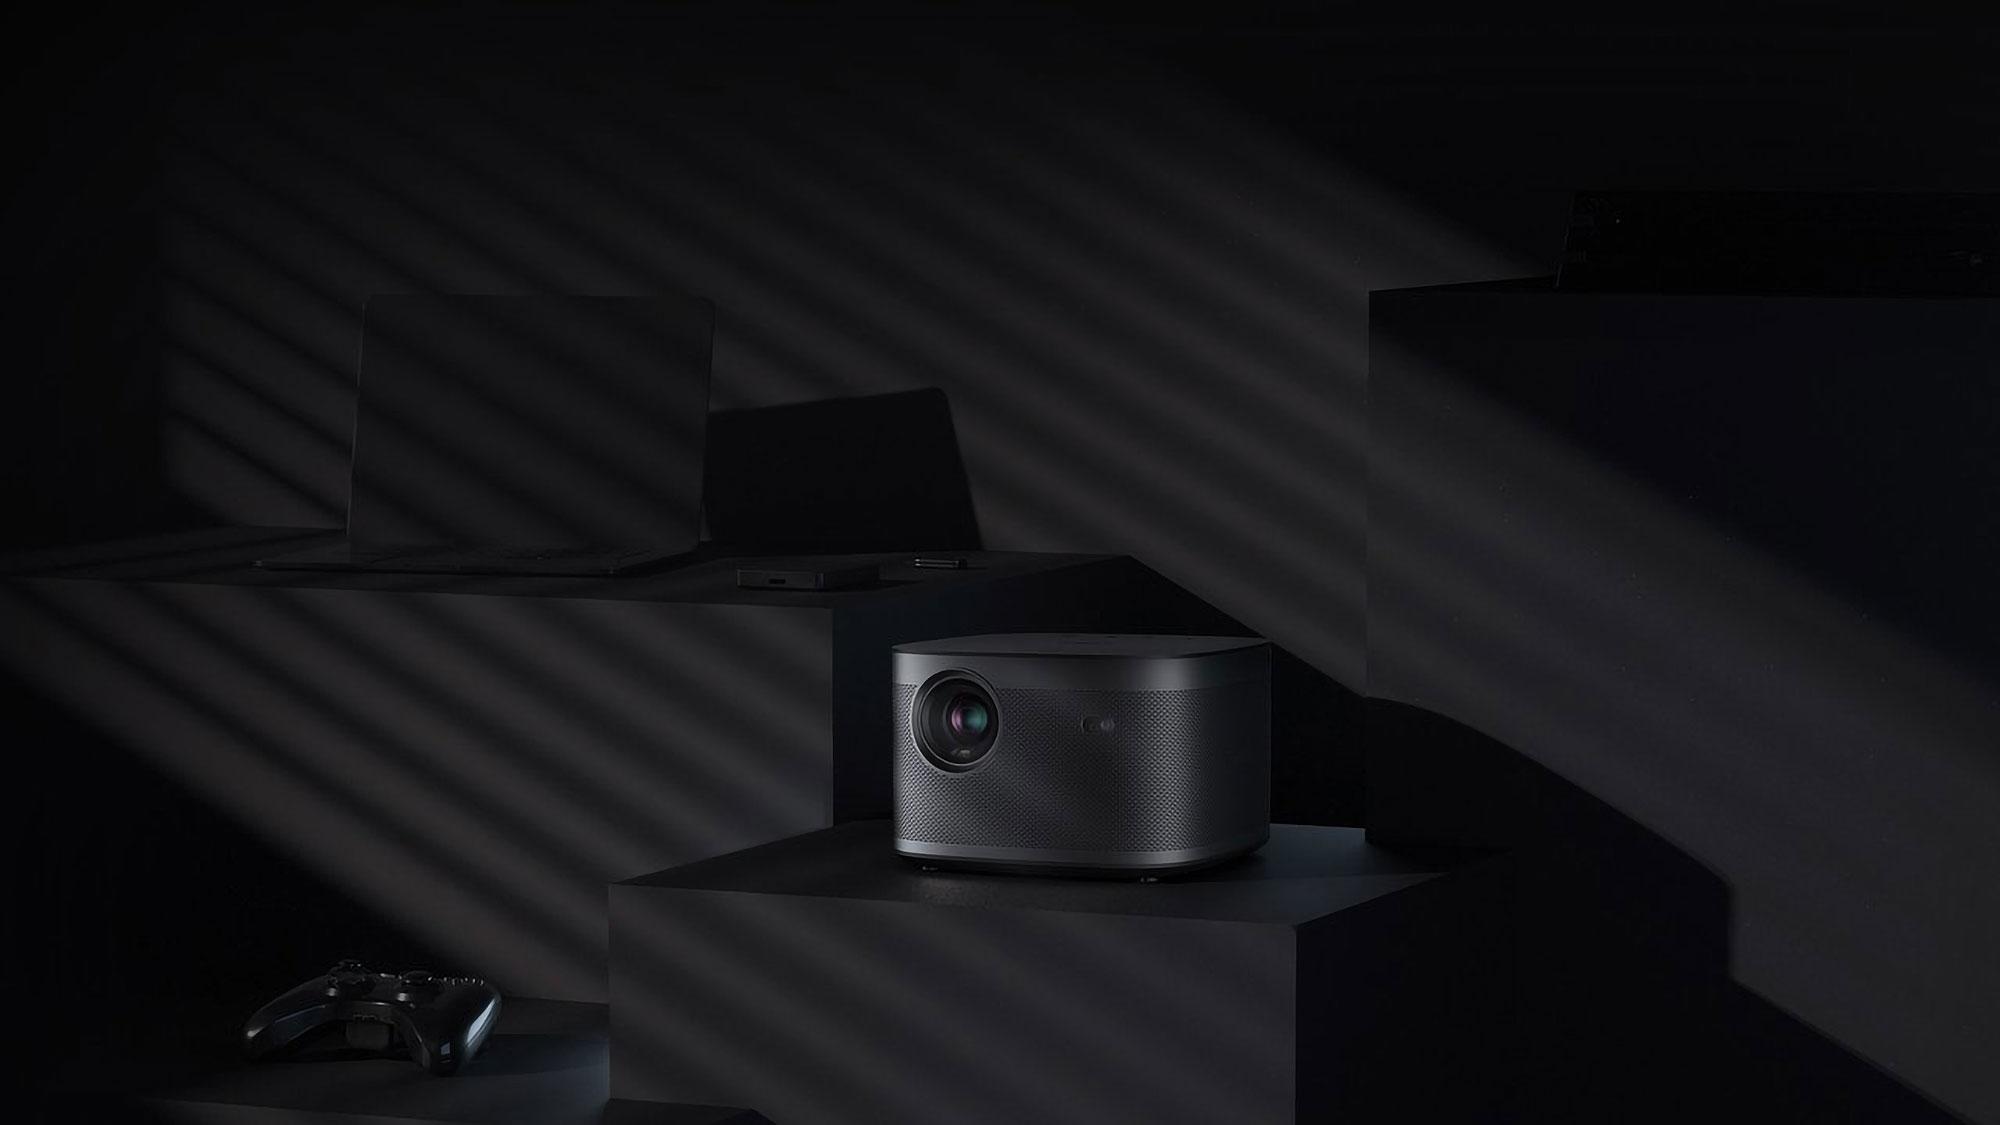 XGIMI Horizon and Horizon Pro Projectors